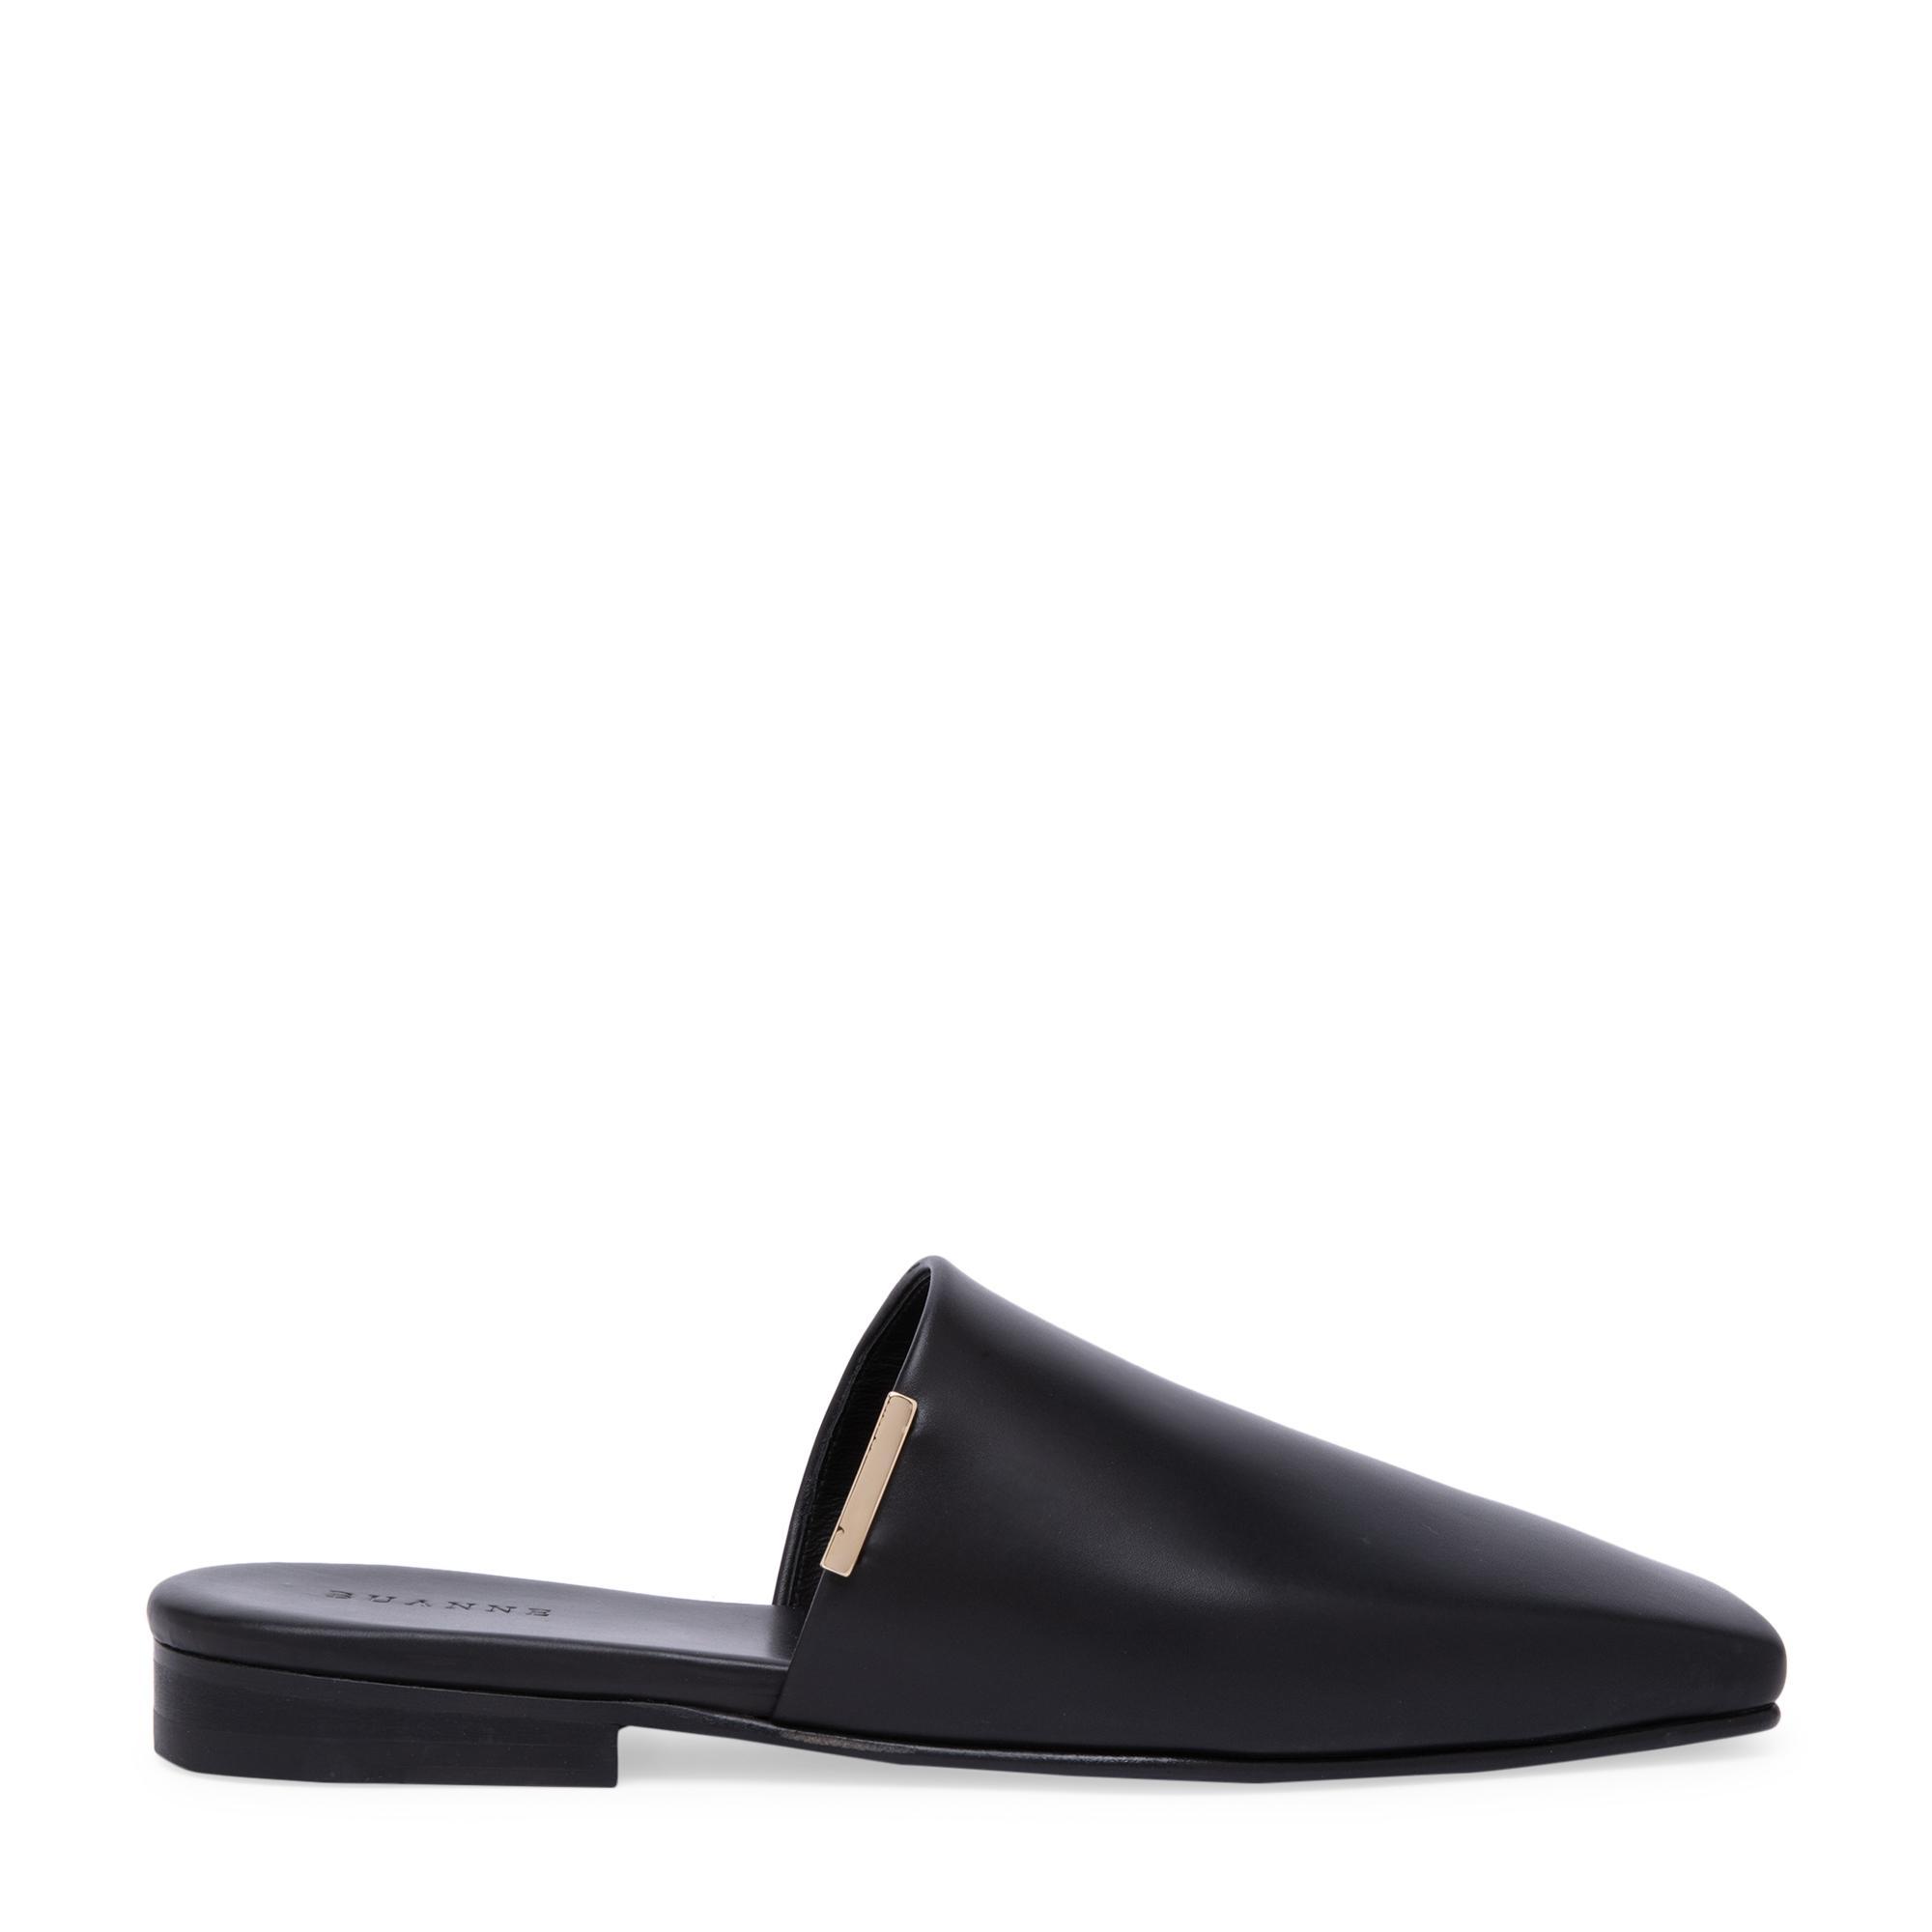 Pisac slippers